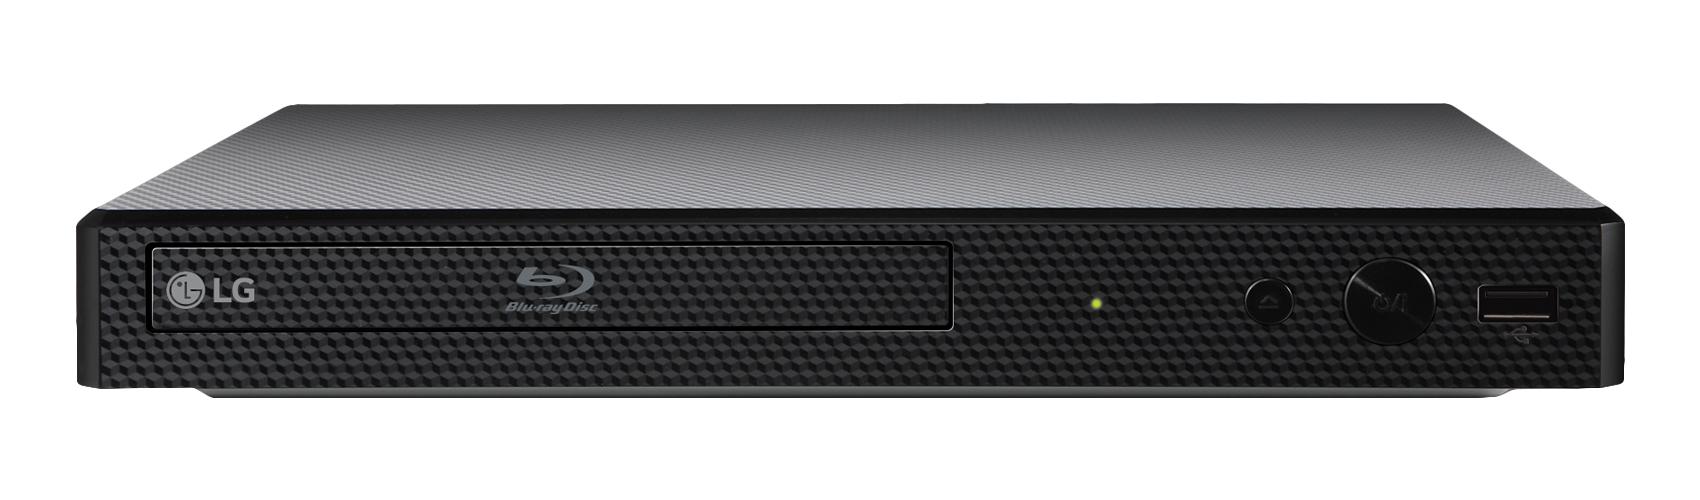 Blu-ray Player Bp250